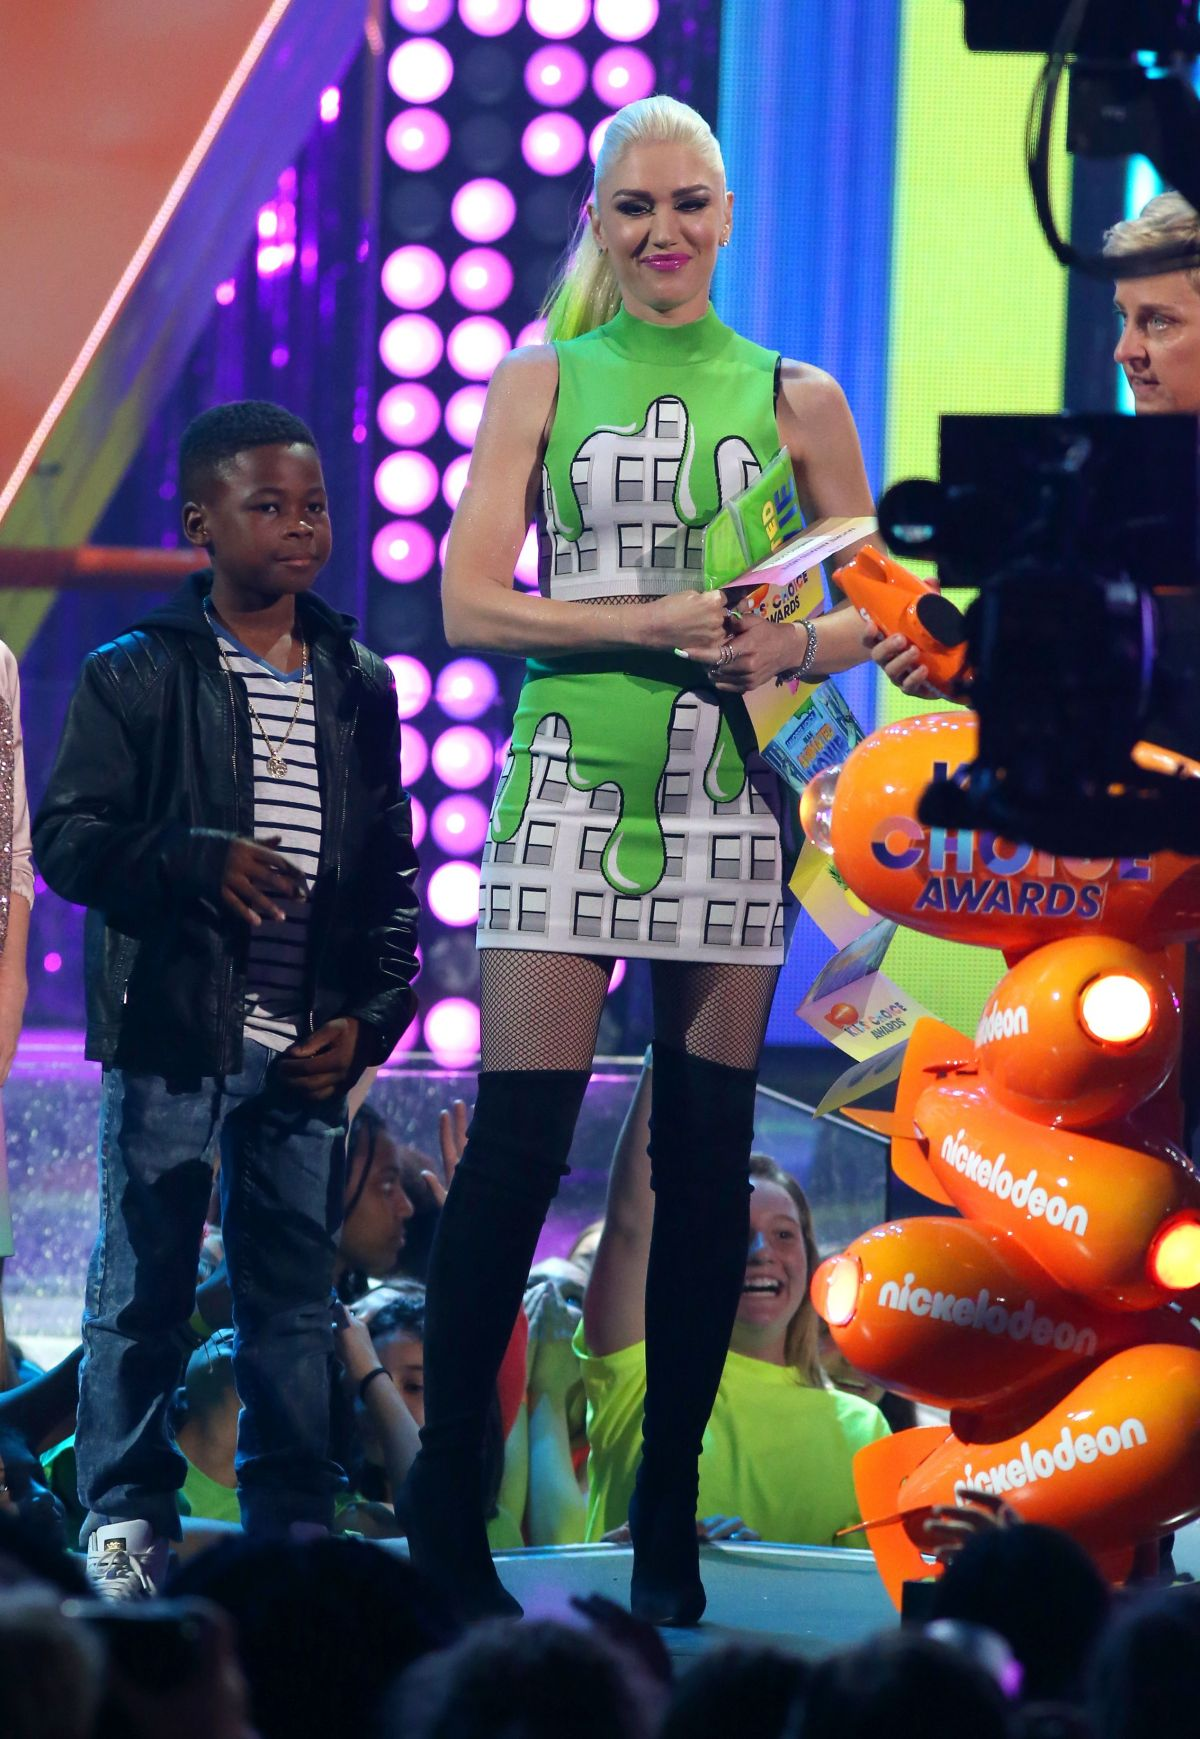 GWEN STEFANI on the Stage at Nickelodeon 2017 Kids